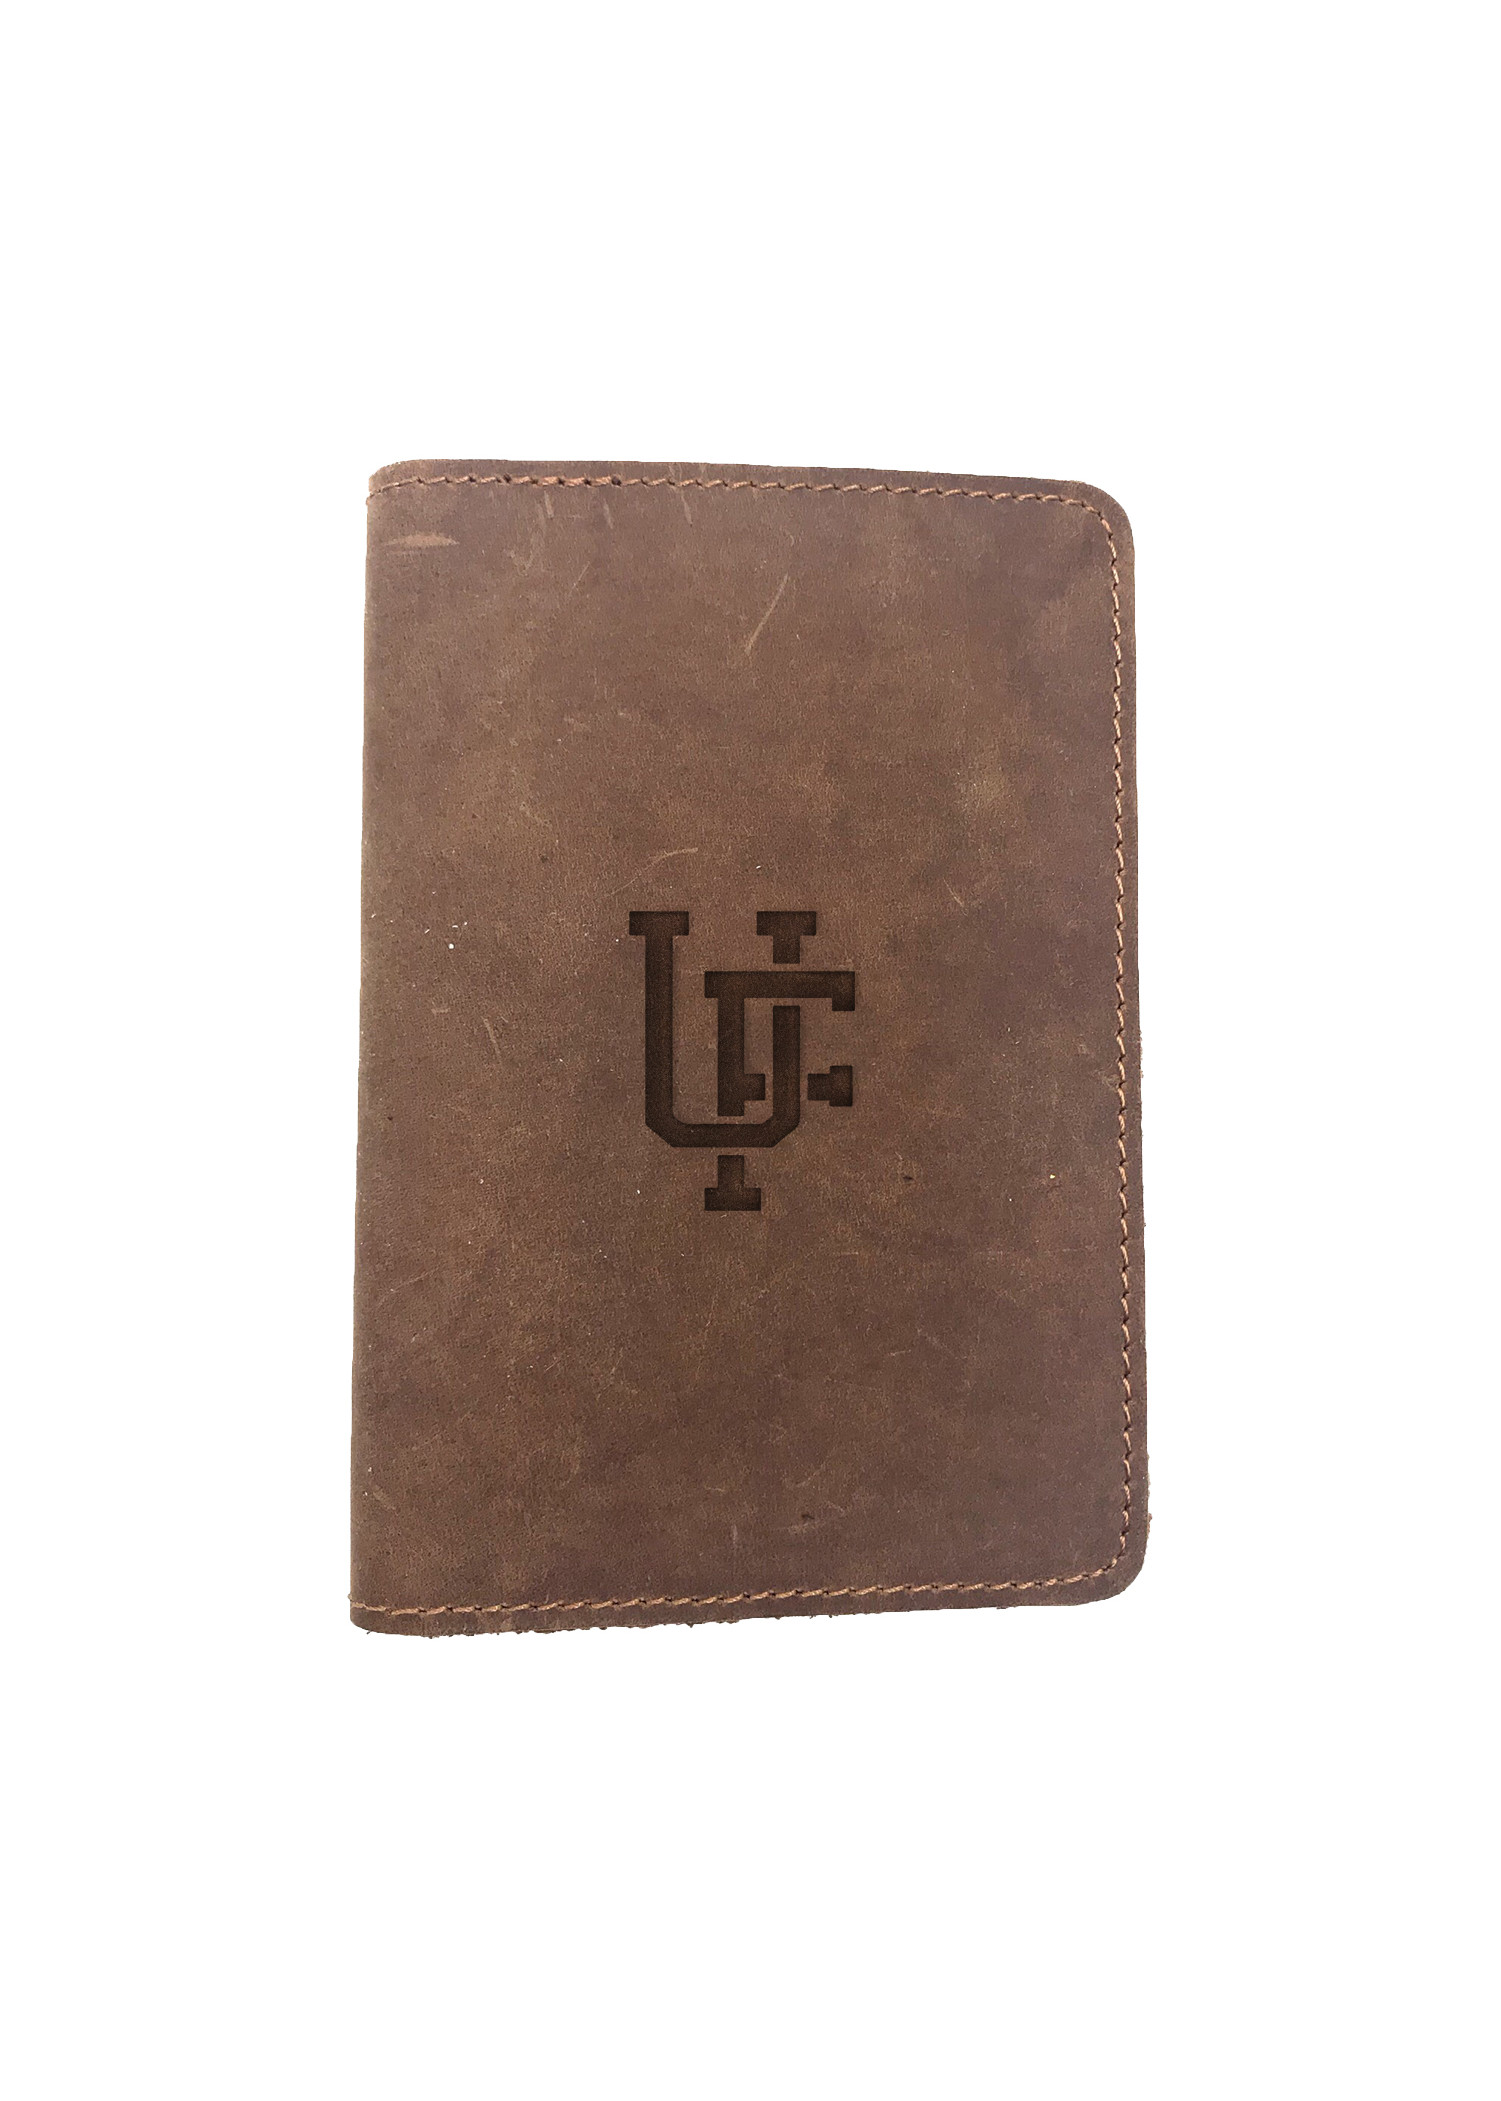 Passport Cover Bao Da Hộ Chiếu Da Sáp Khắc Hình Logo UF ICON UNIVERSITY OF FLORIDA (BROWN)